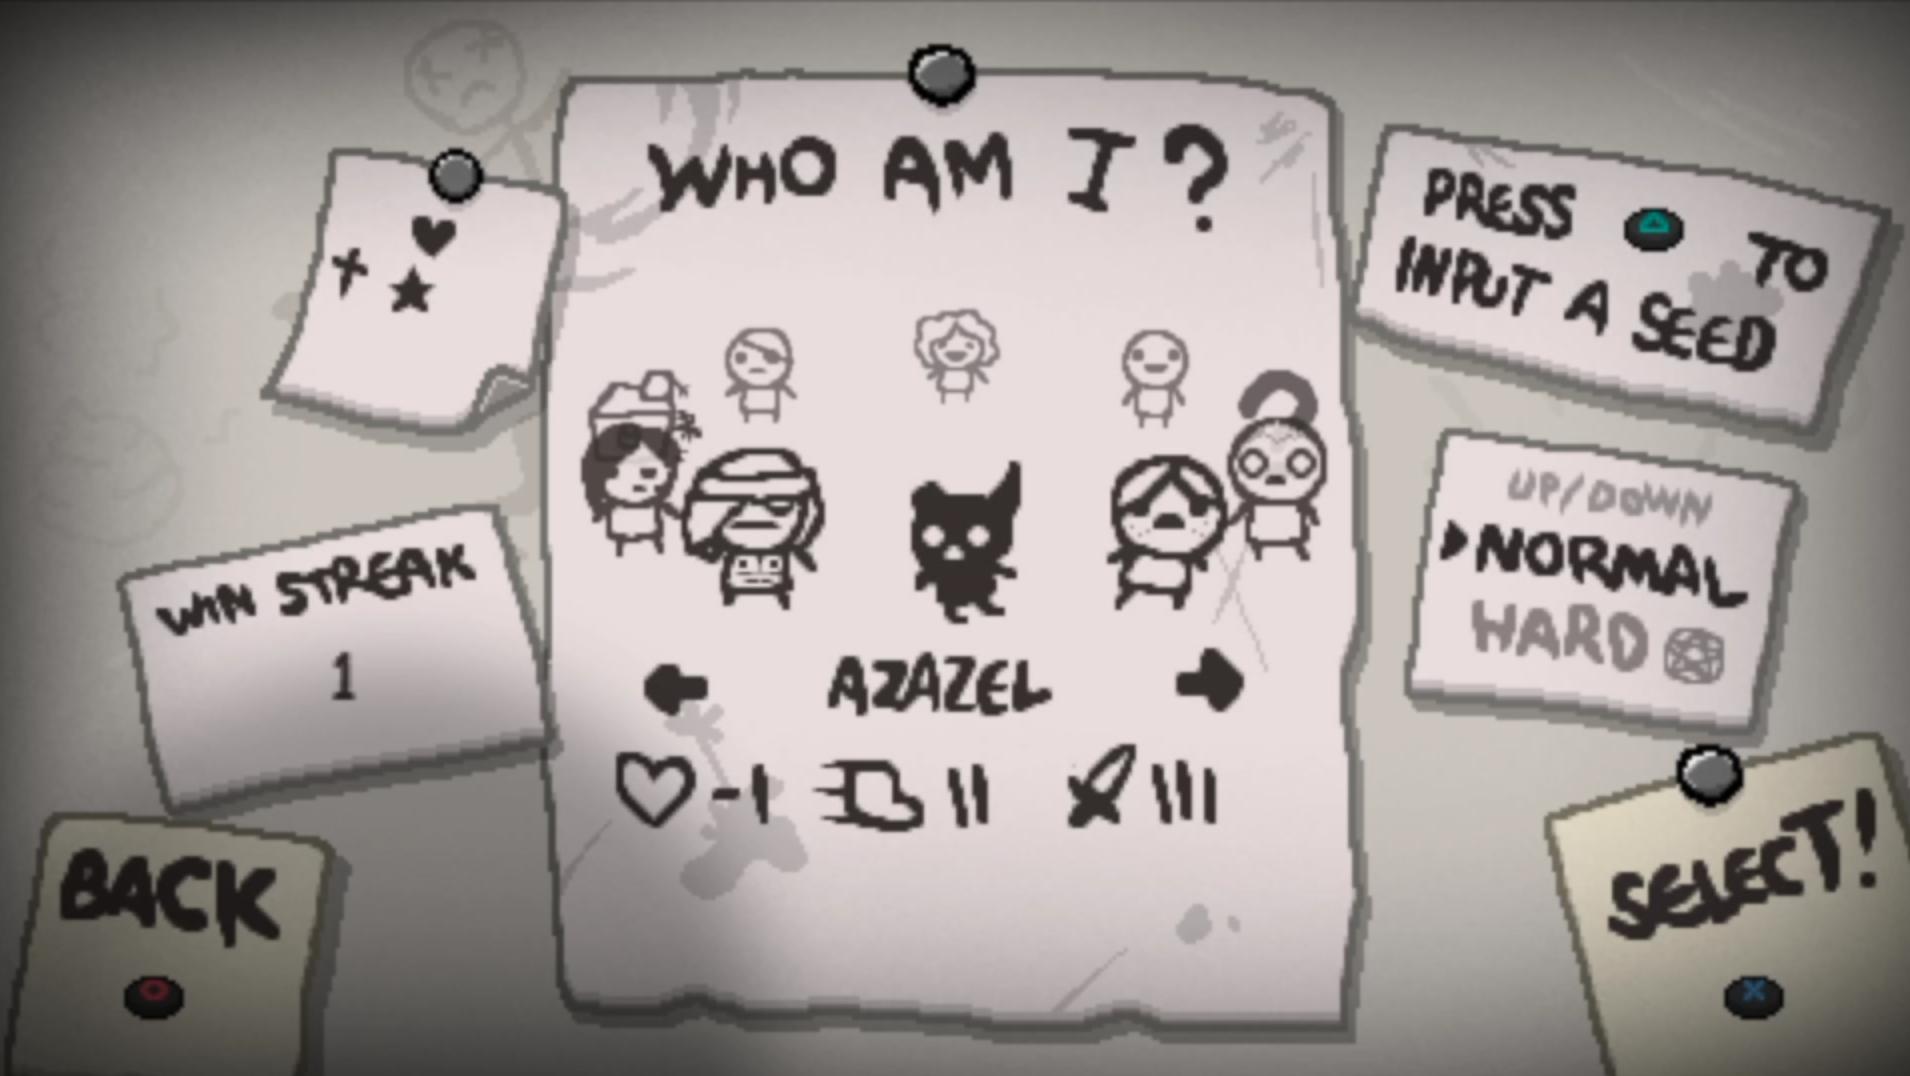 Azazel (character select screen)